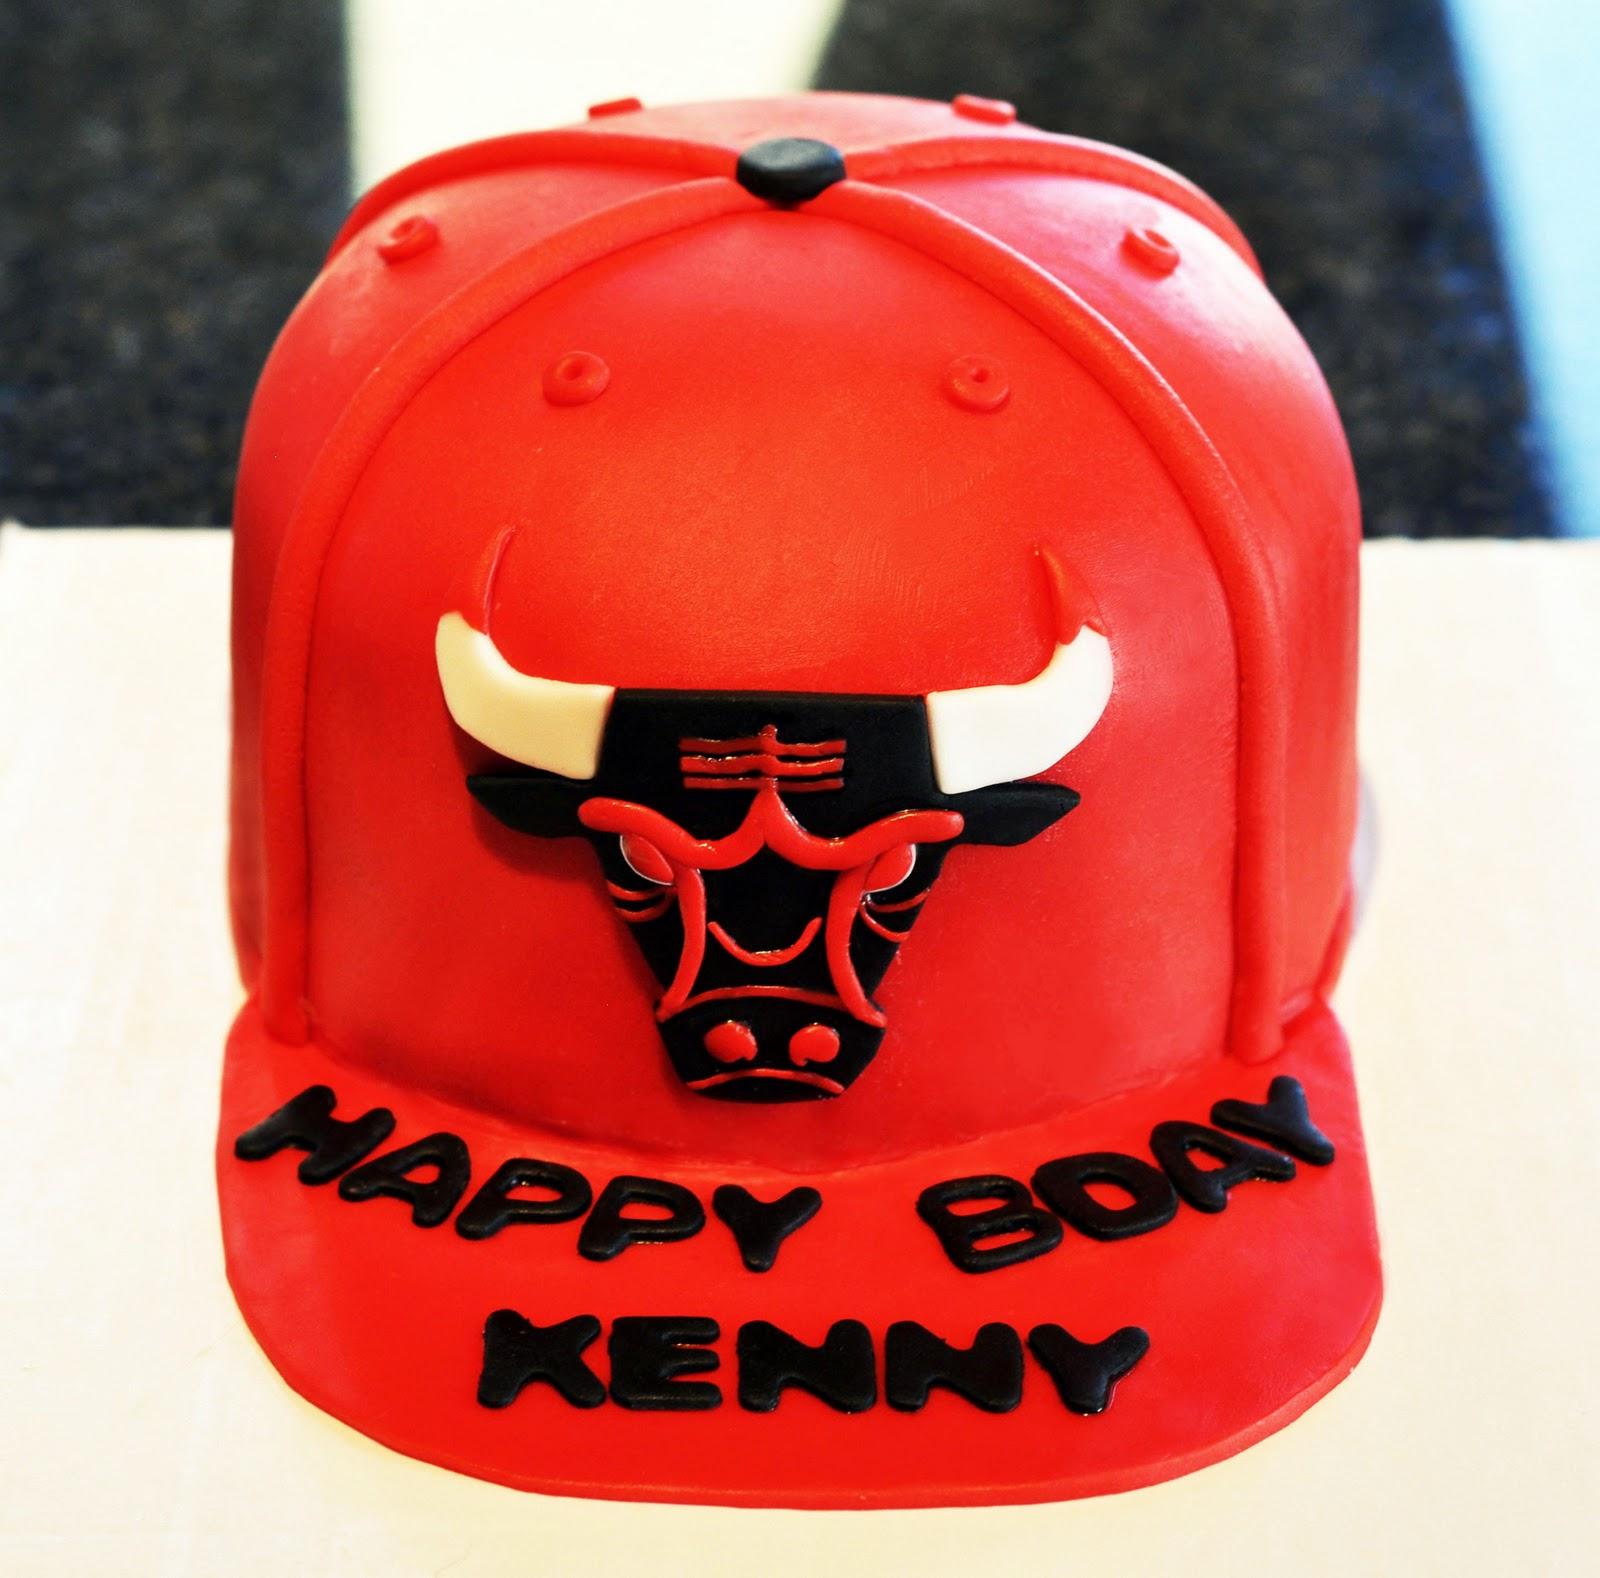 official photos e6319 85682 Chicago Bulls Hat Cake